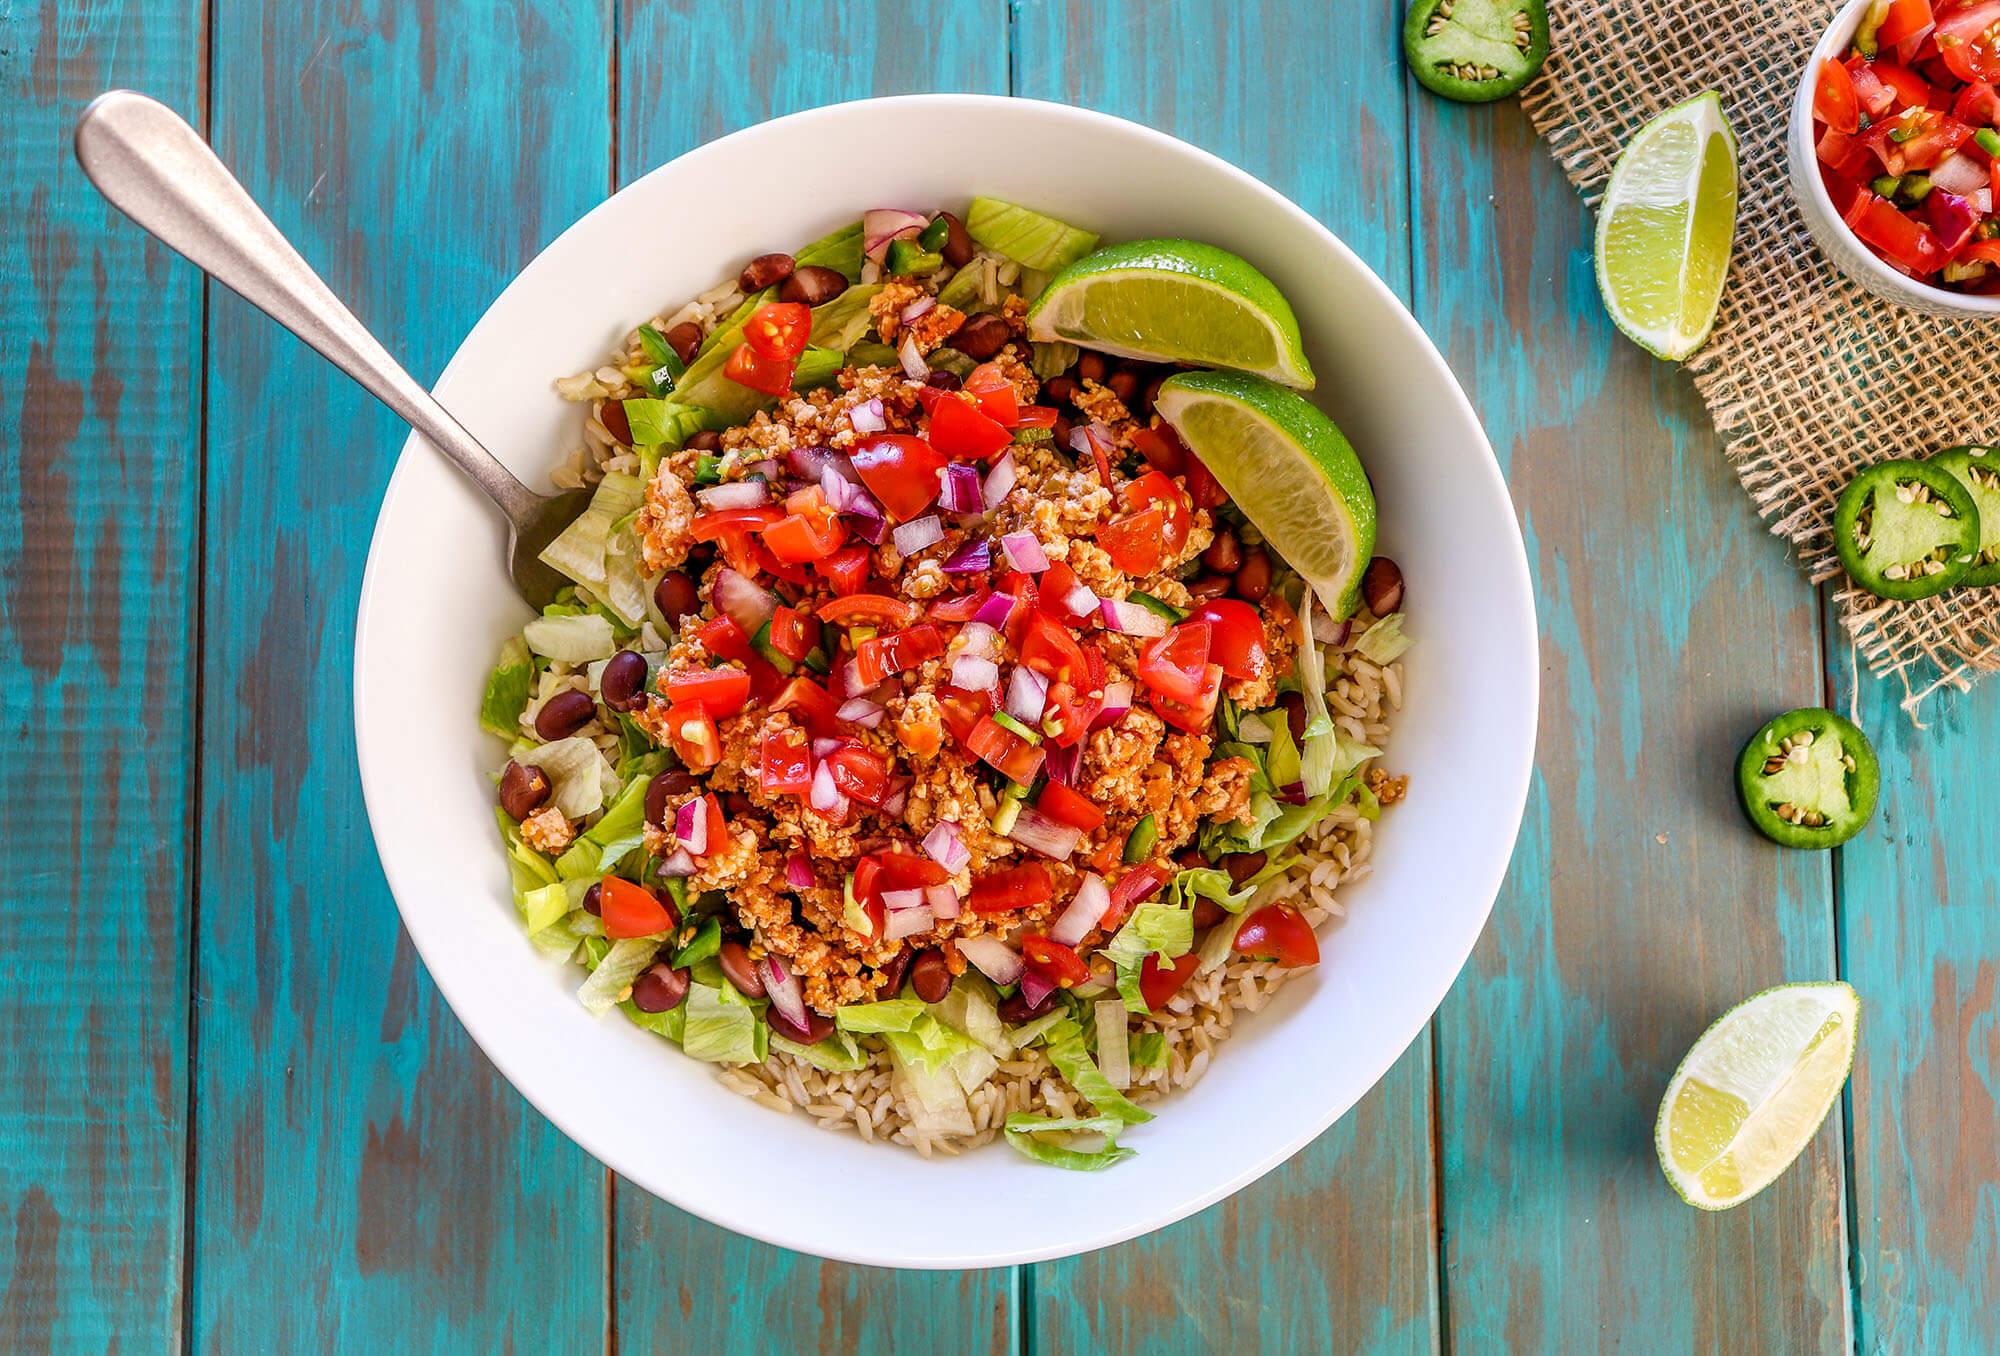 Plant-Based Meal Prep: Sofritas Burrito Bowl